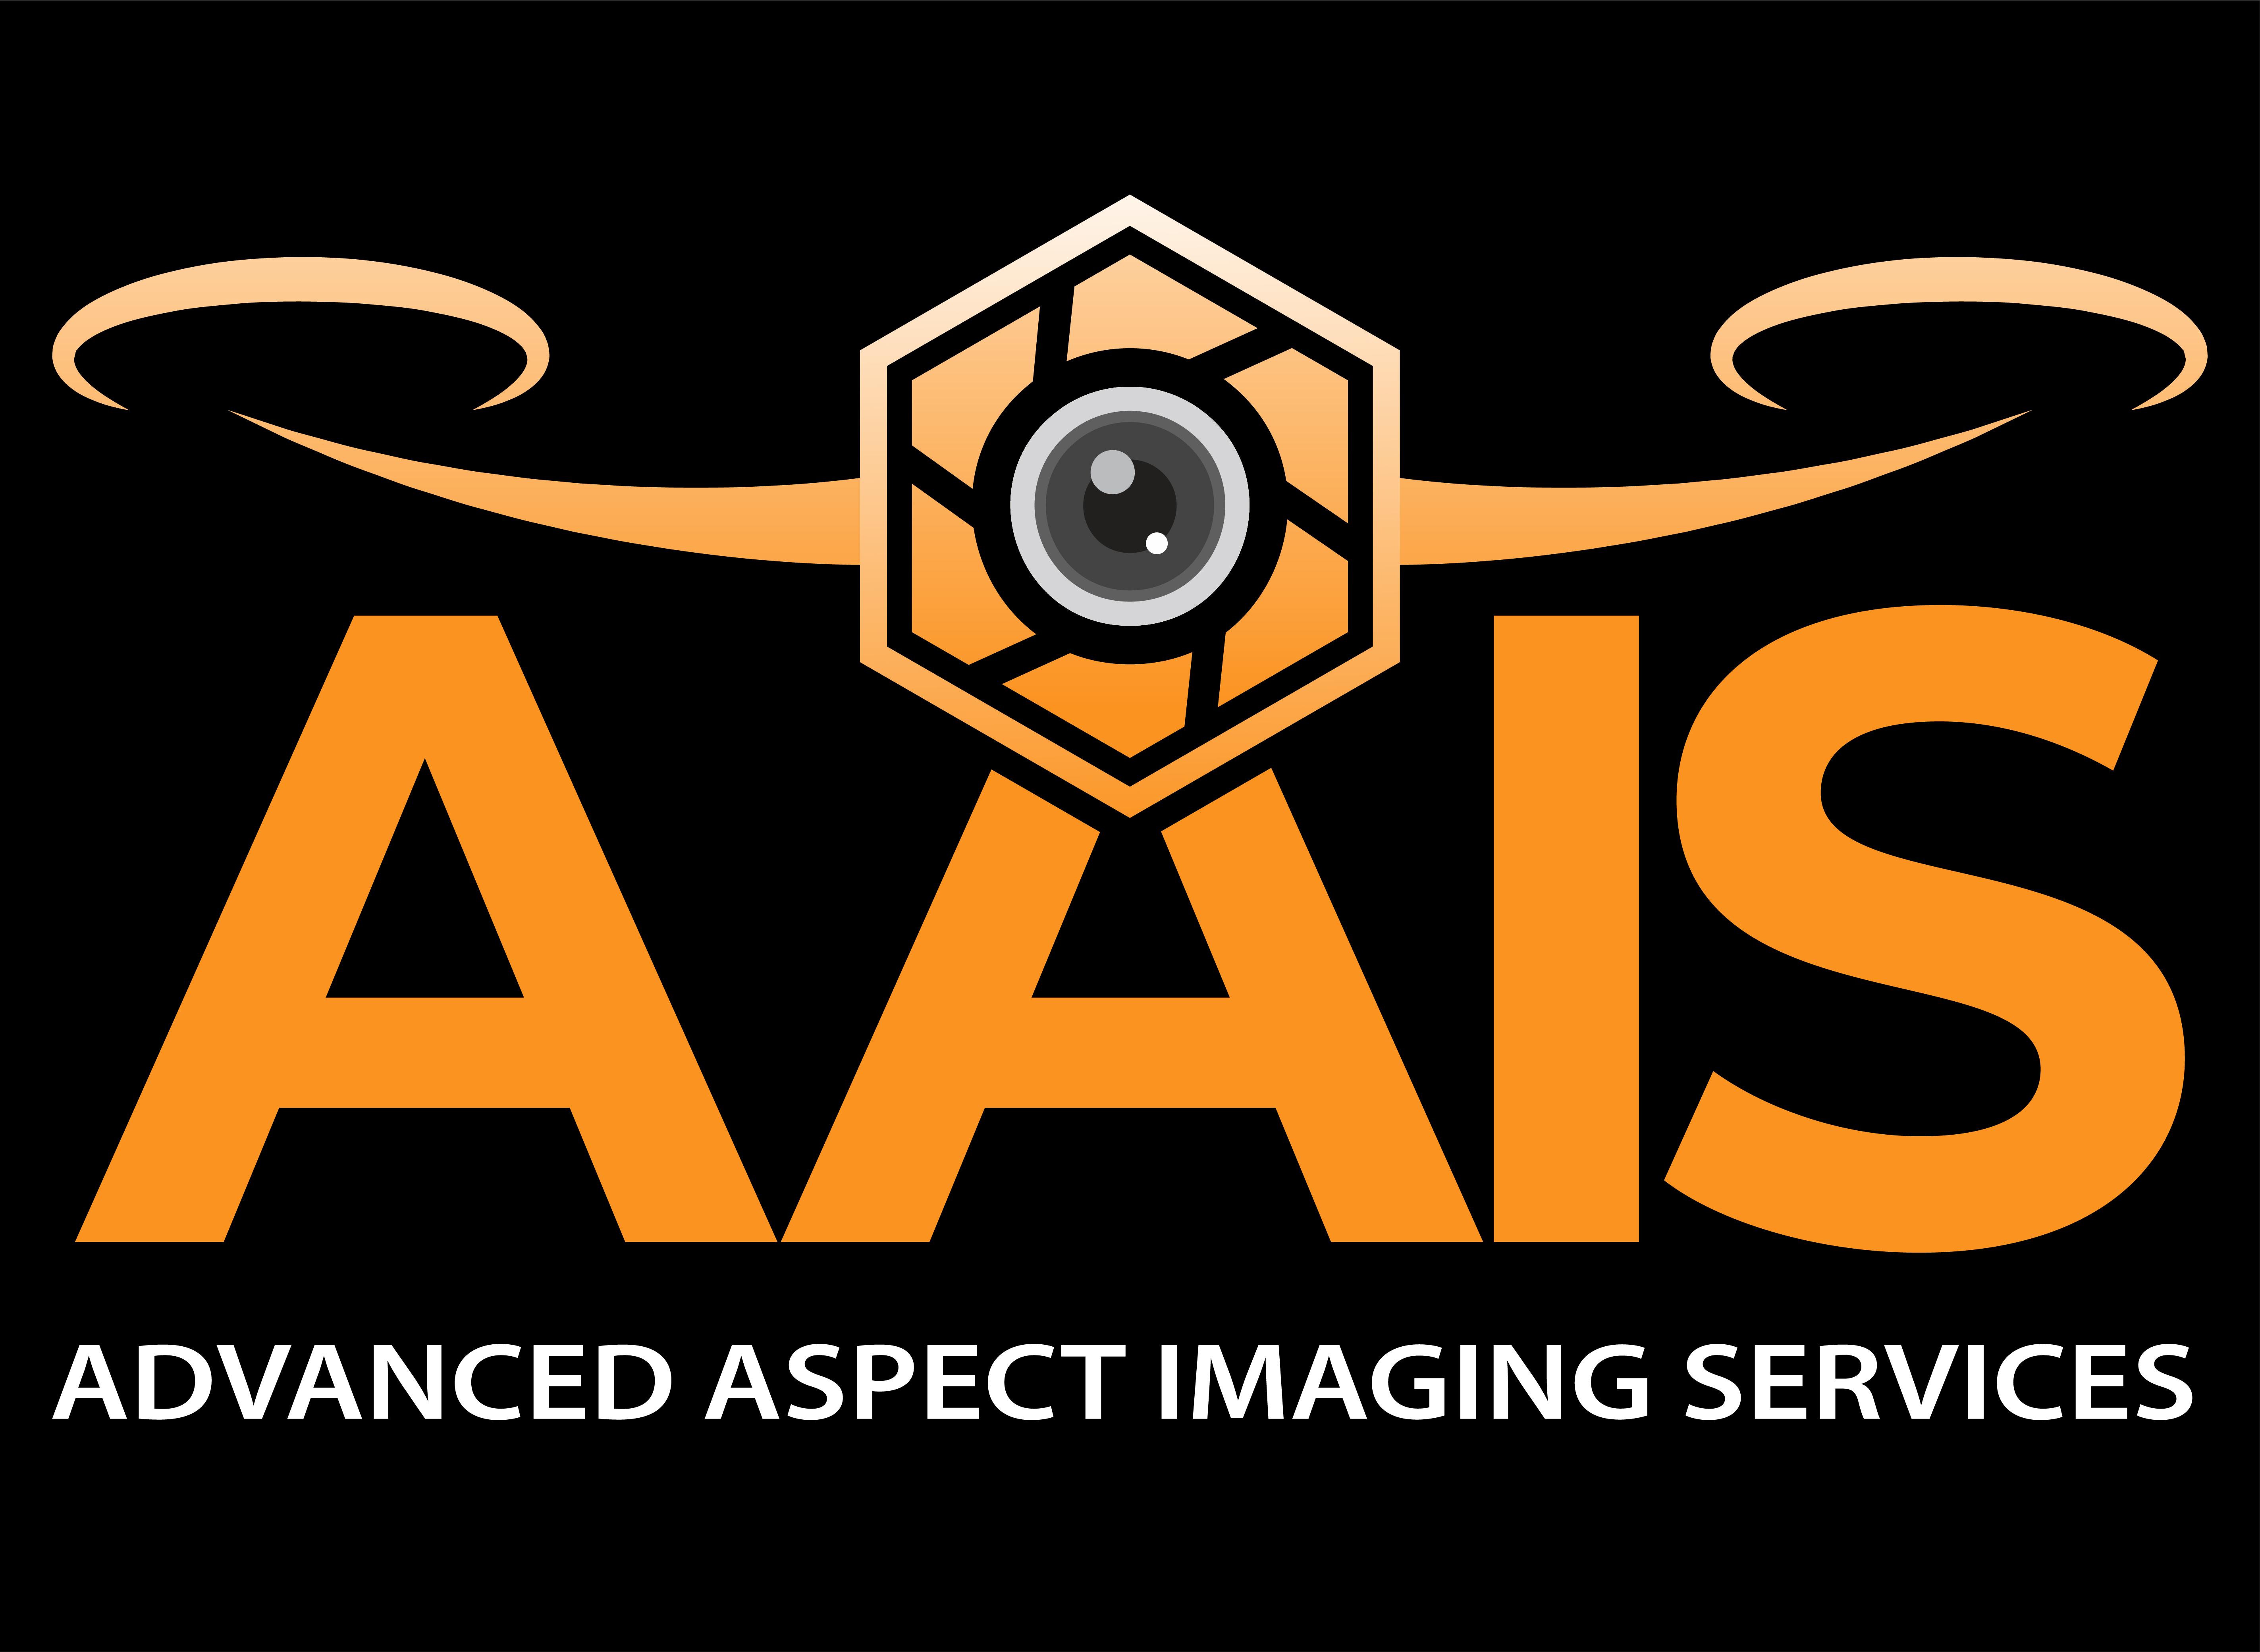 AAIS - Advanced Aspect Imaging Services